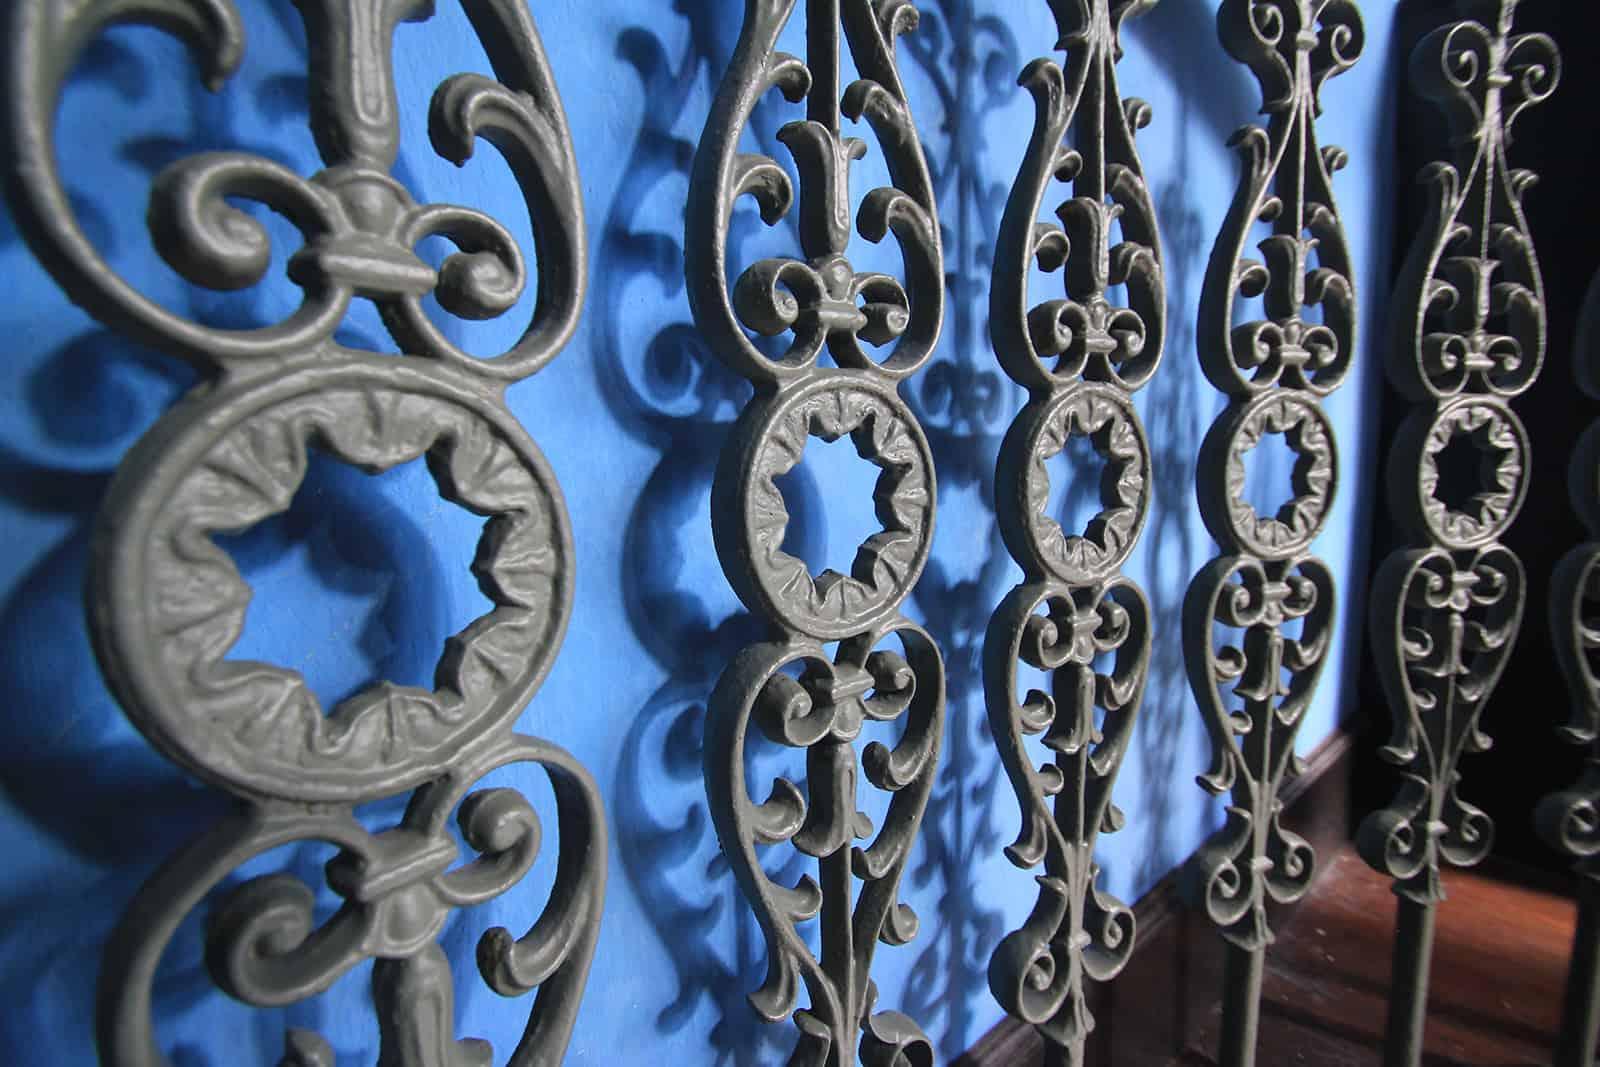 boutique-hotel-penang-island-blue-mansion-architecture-14_cruijq Architecture